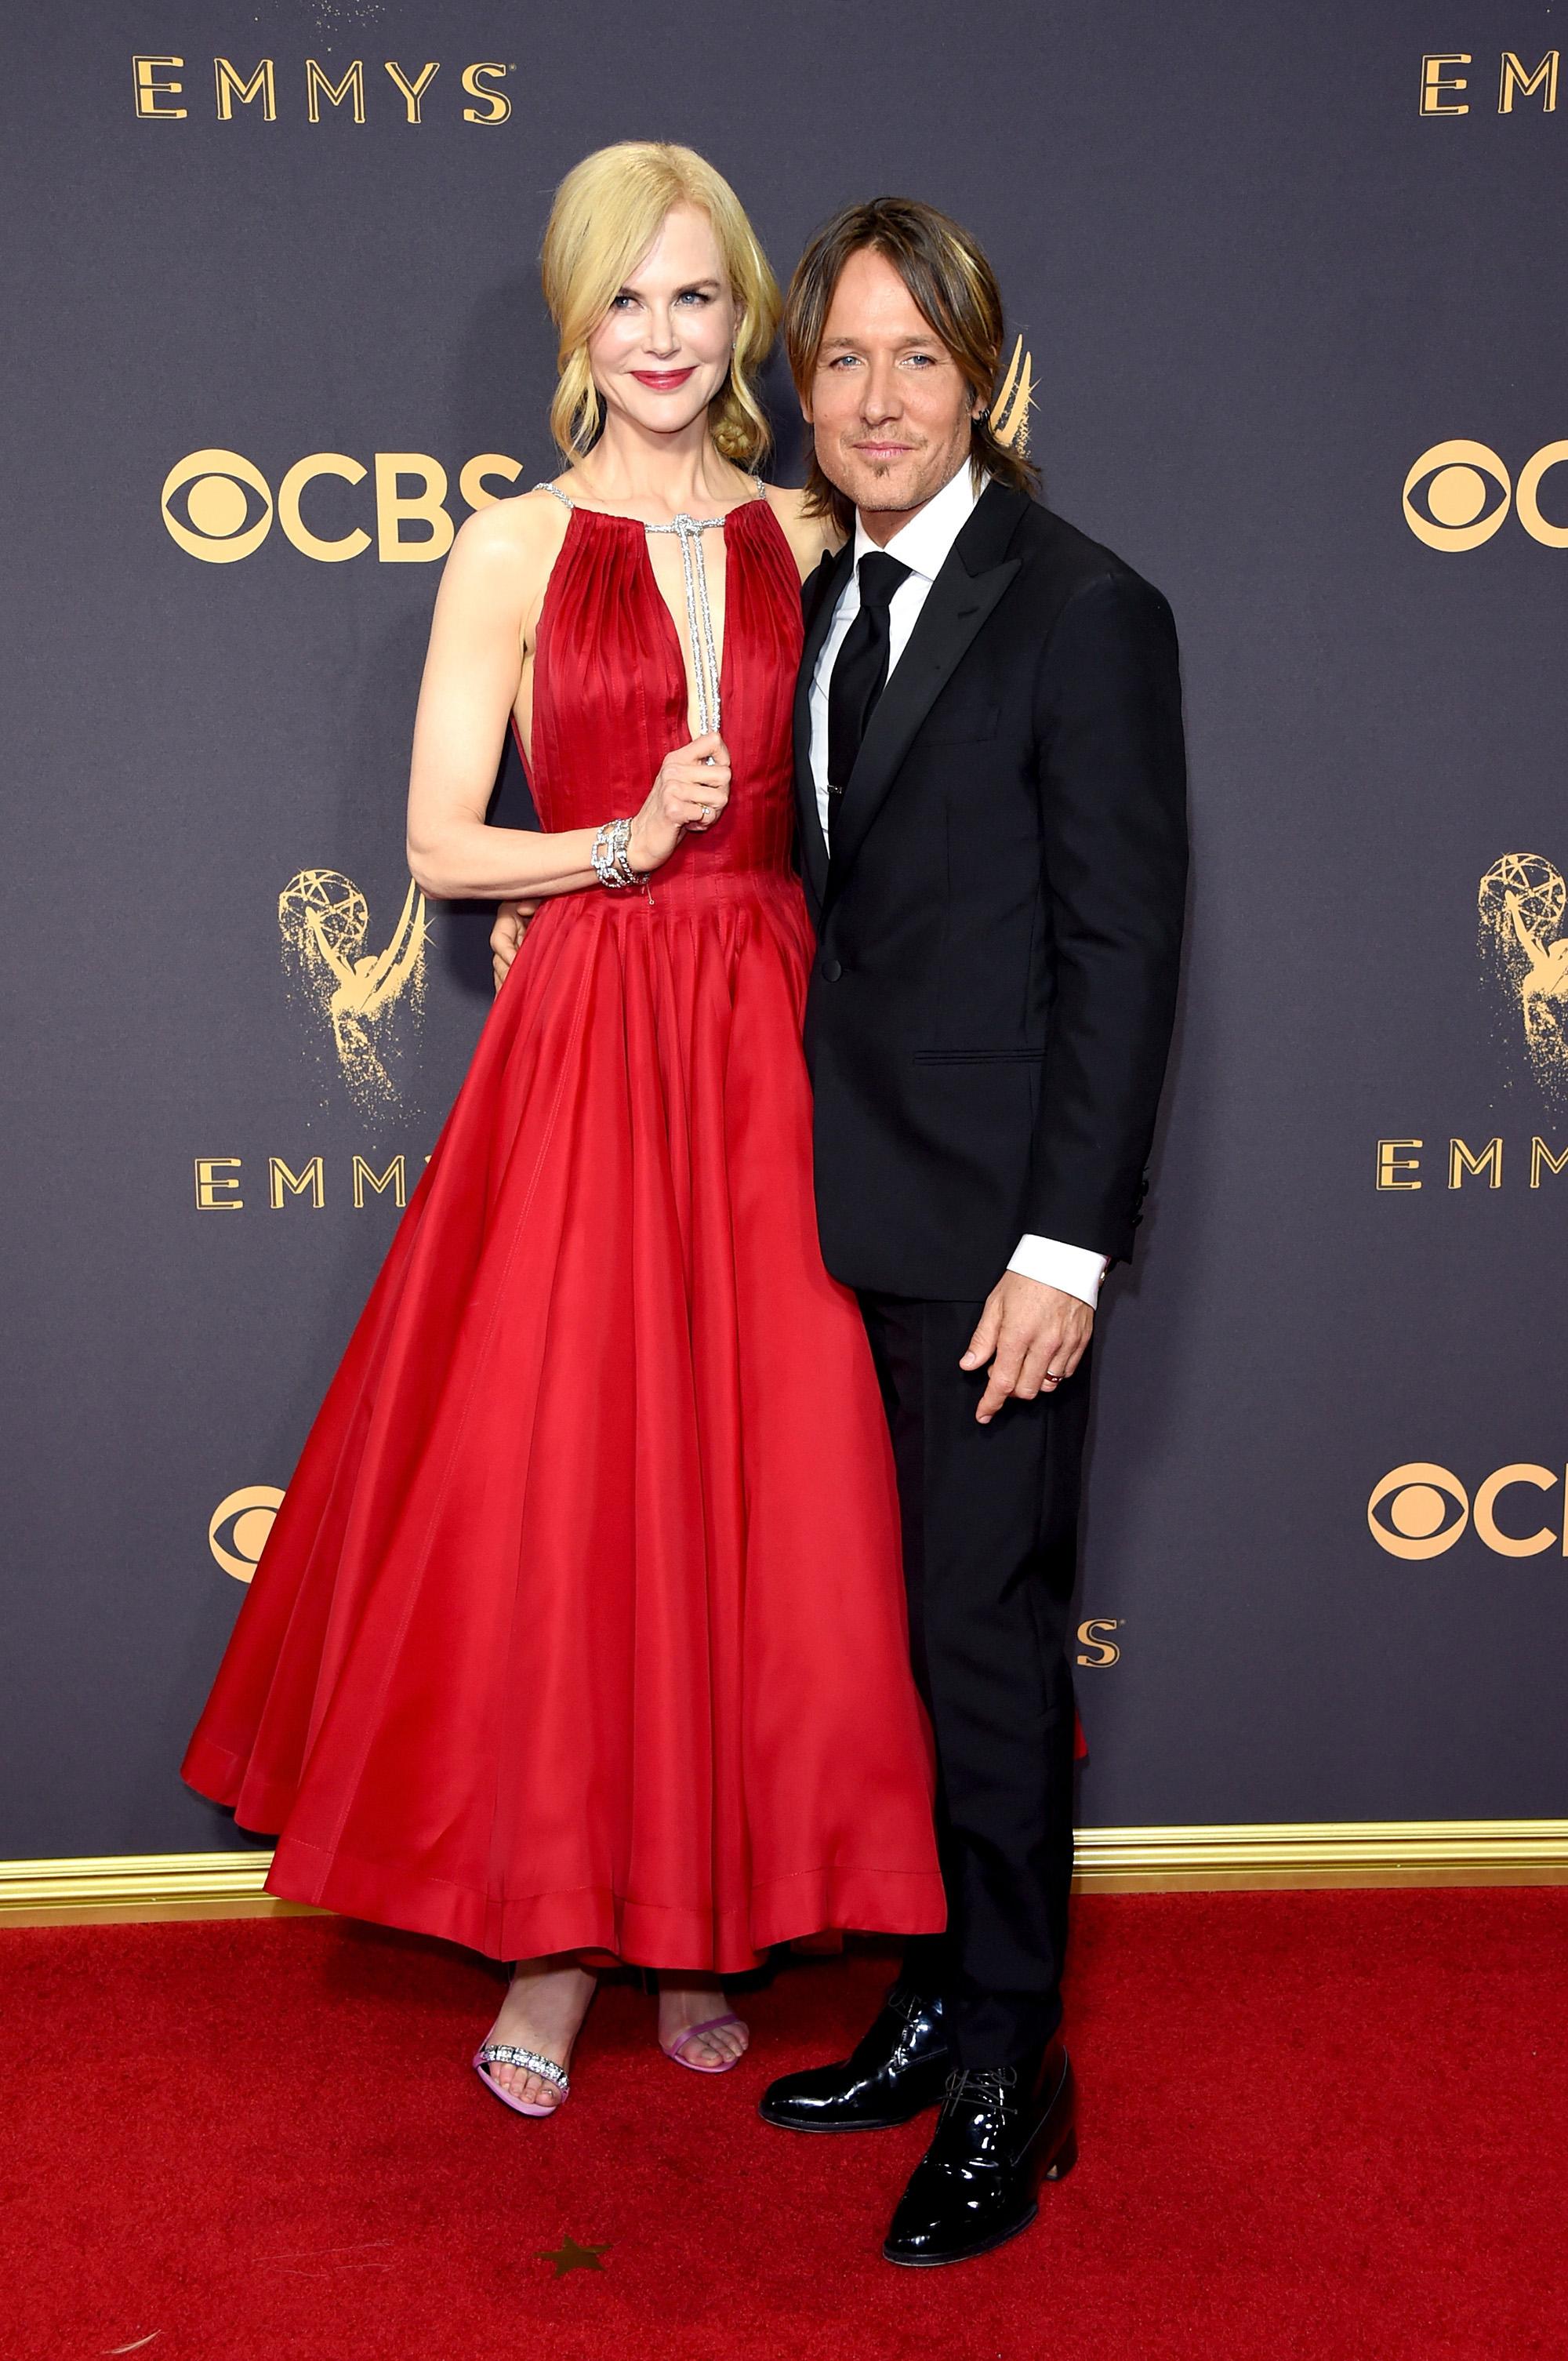 Nicole Kidman and Keith Urban Emmys 2017